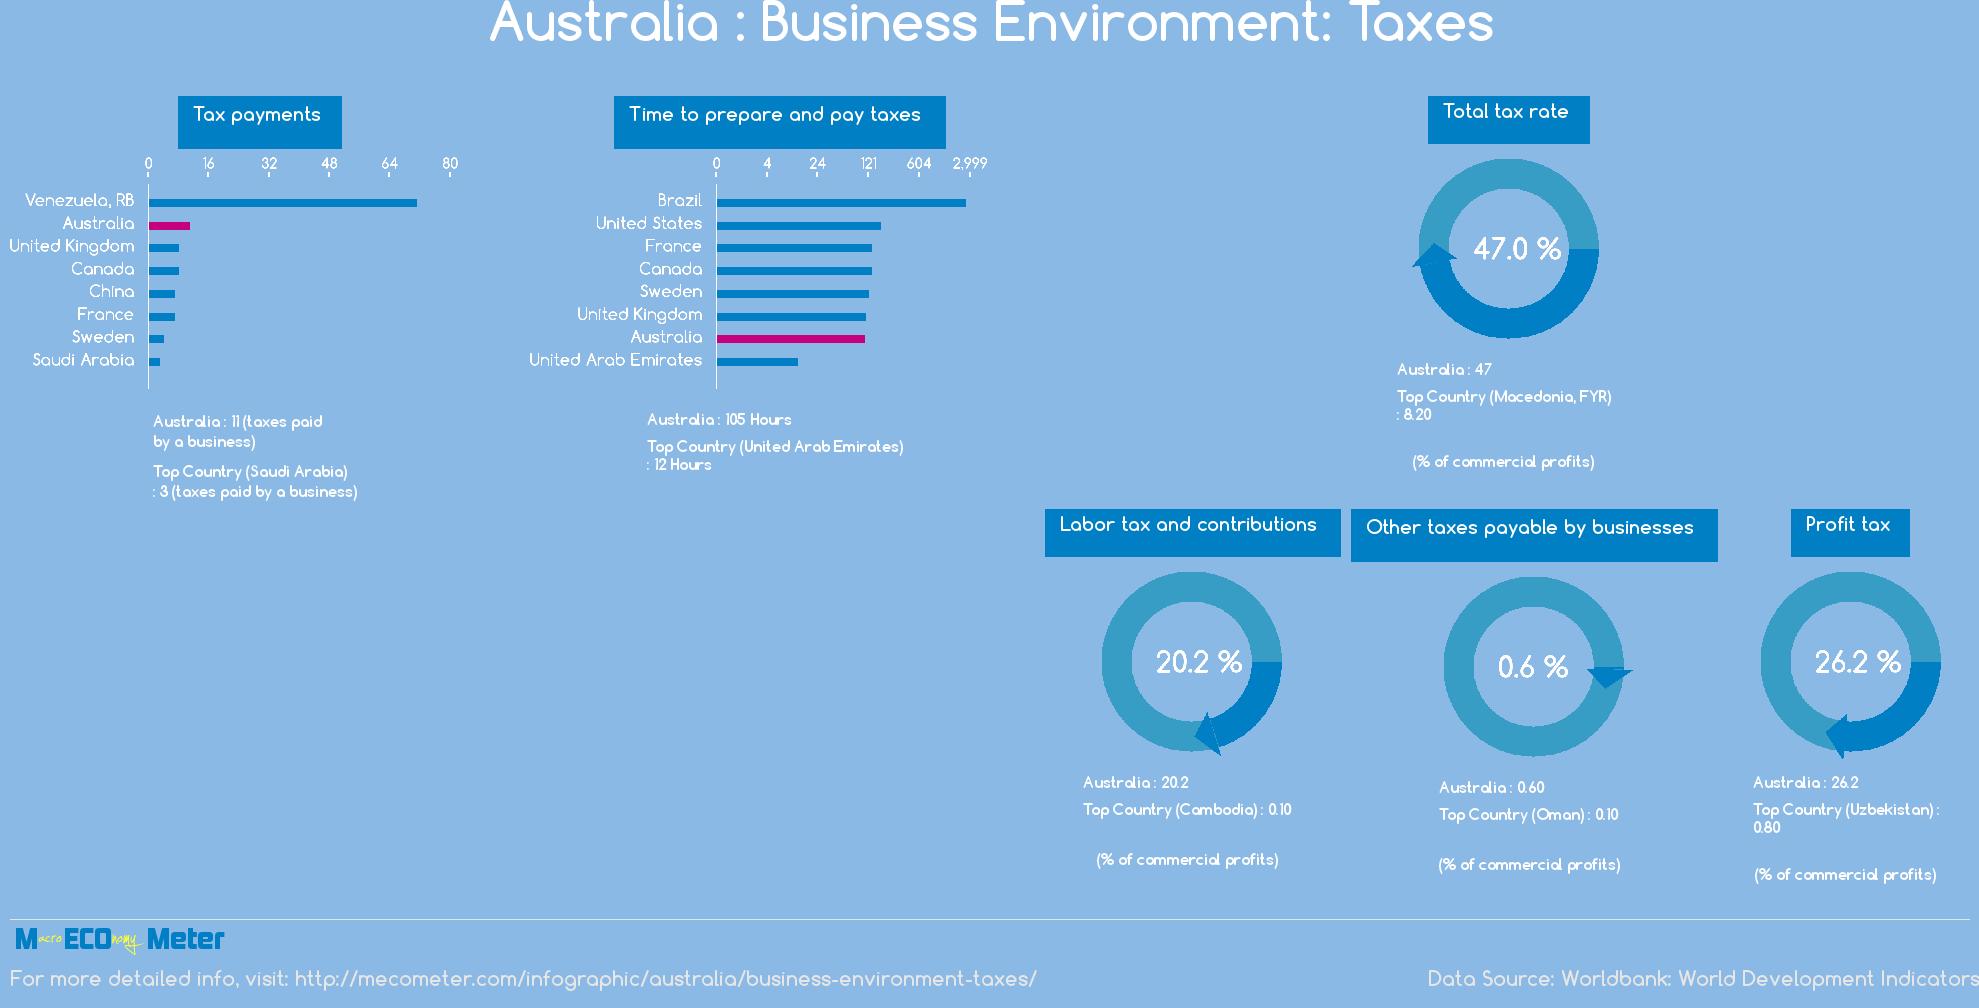 Australia : Business Environment: Taxes